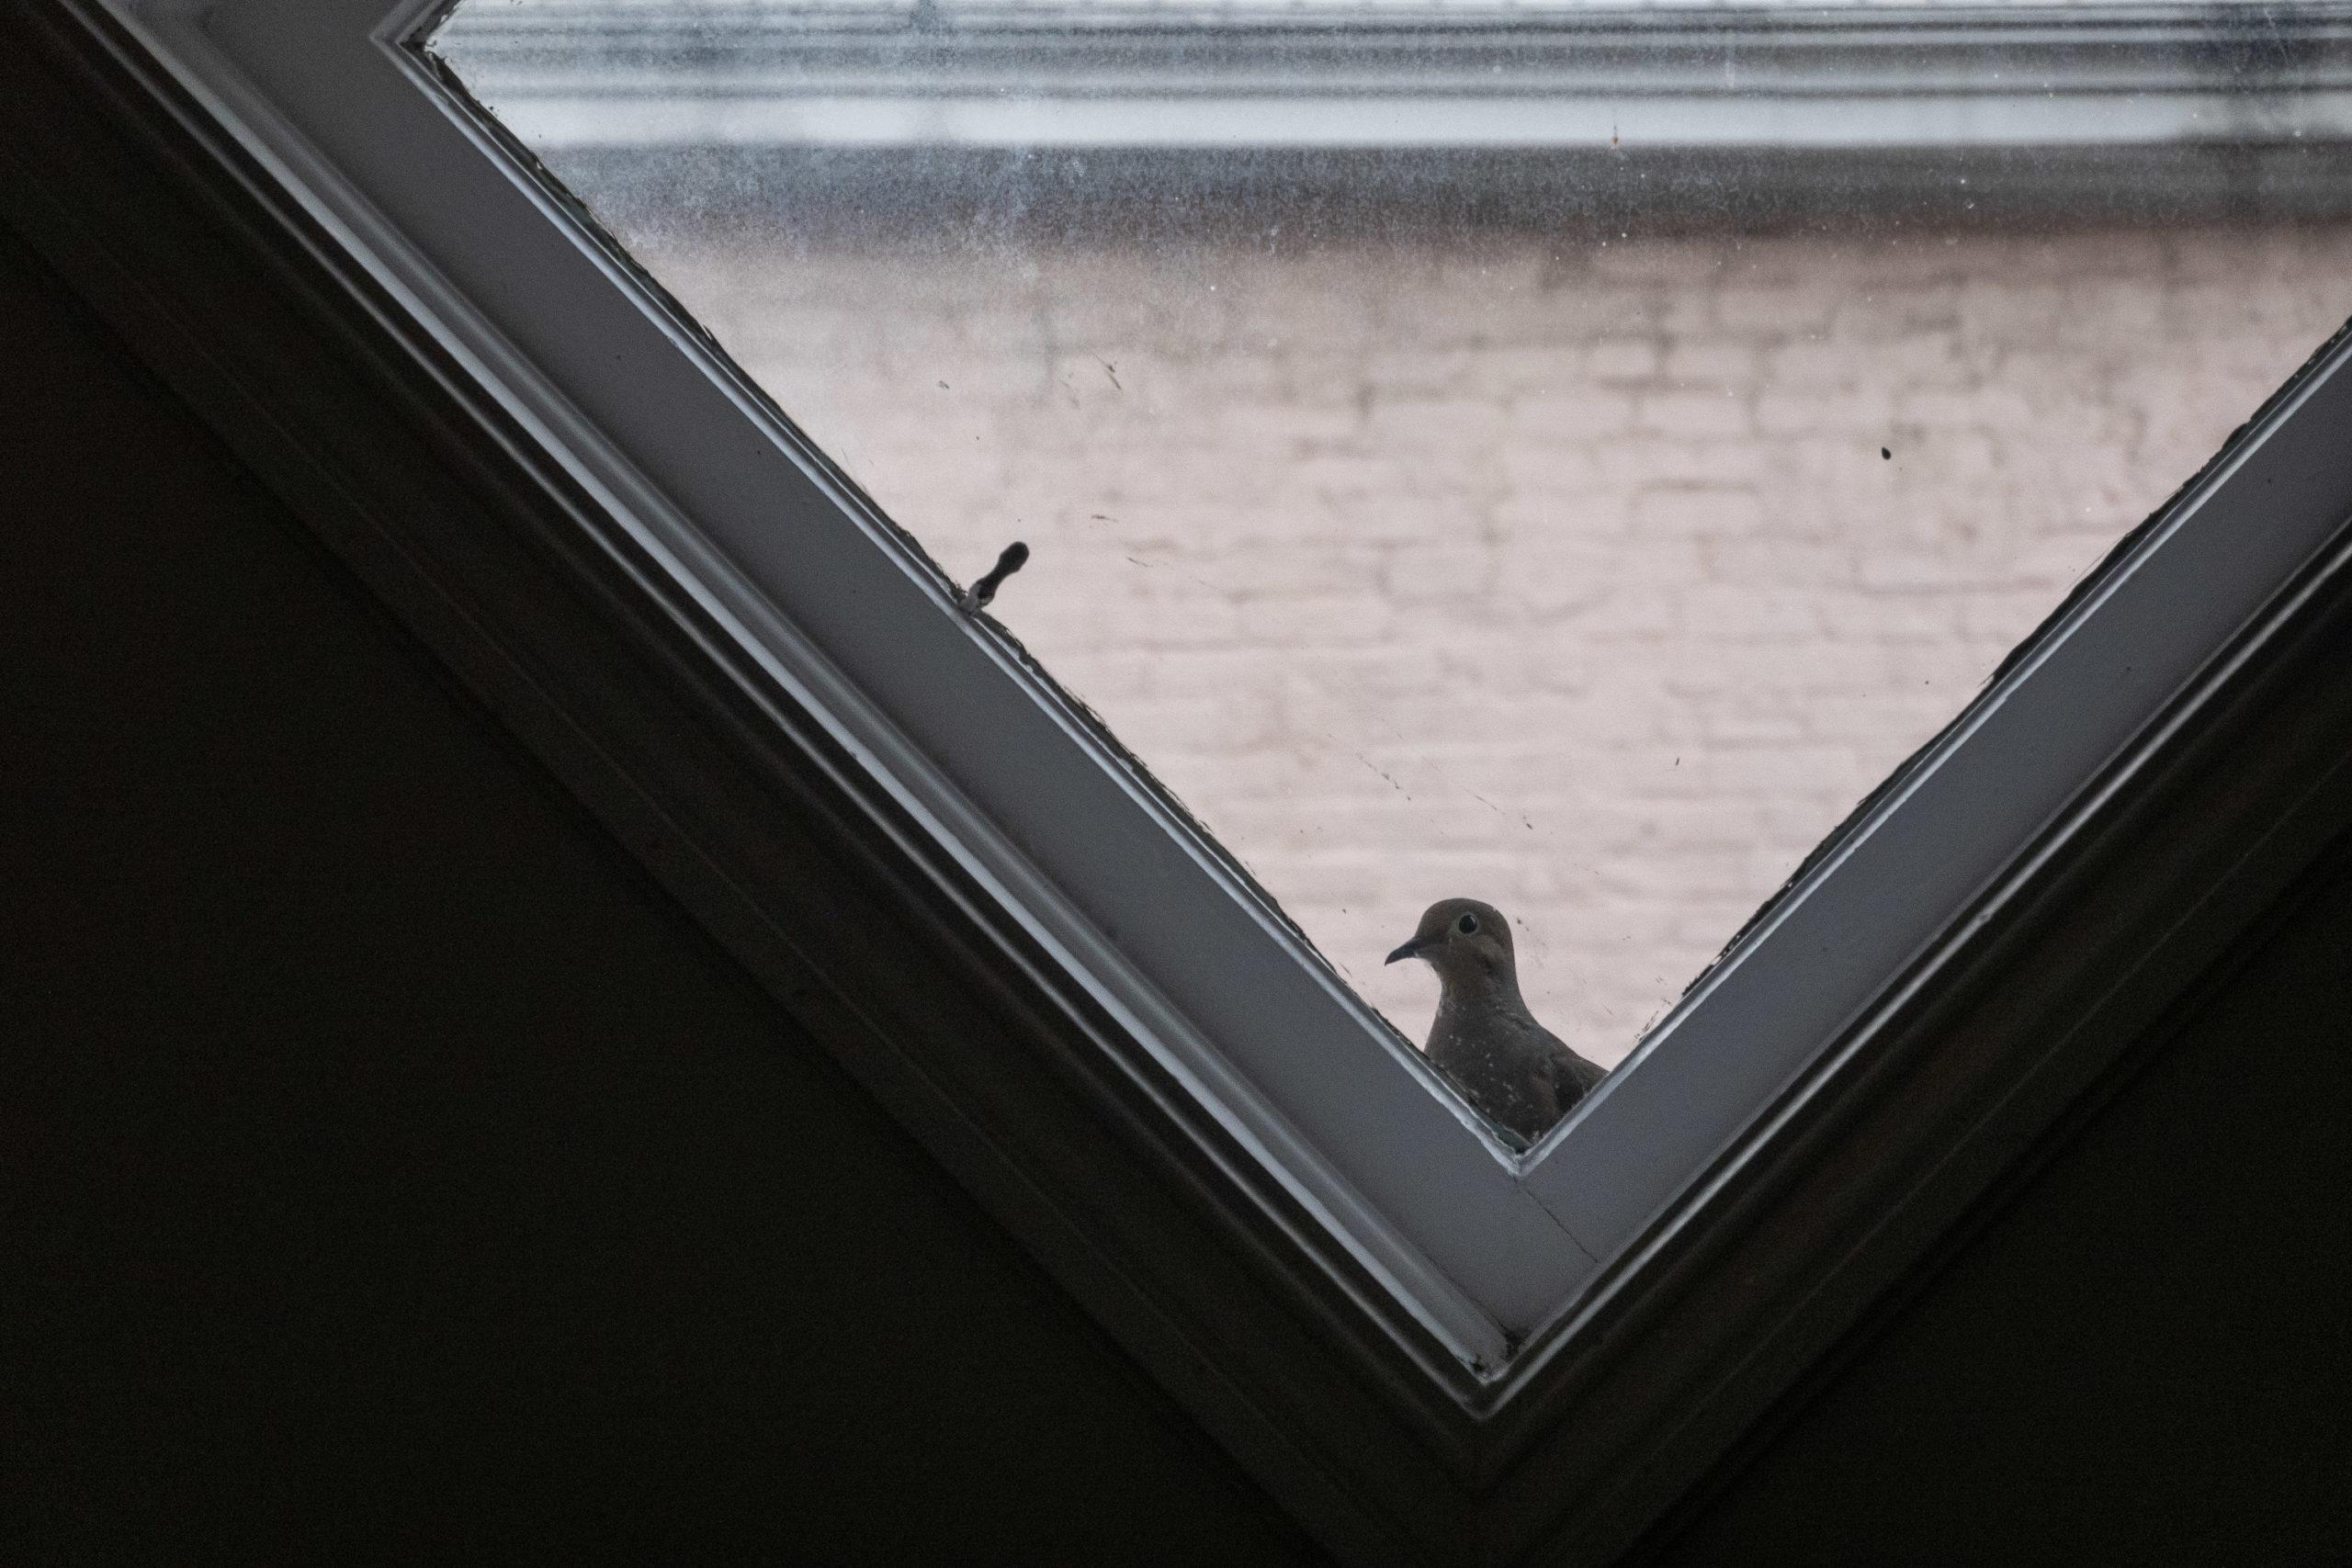 A dove looks through a diamond shaped window